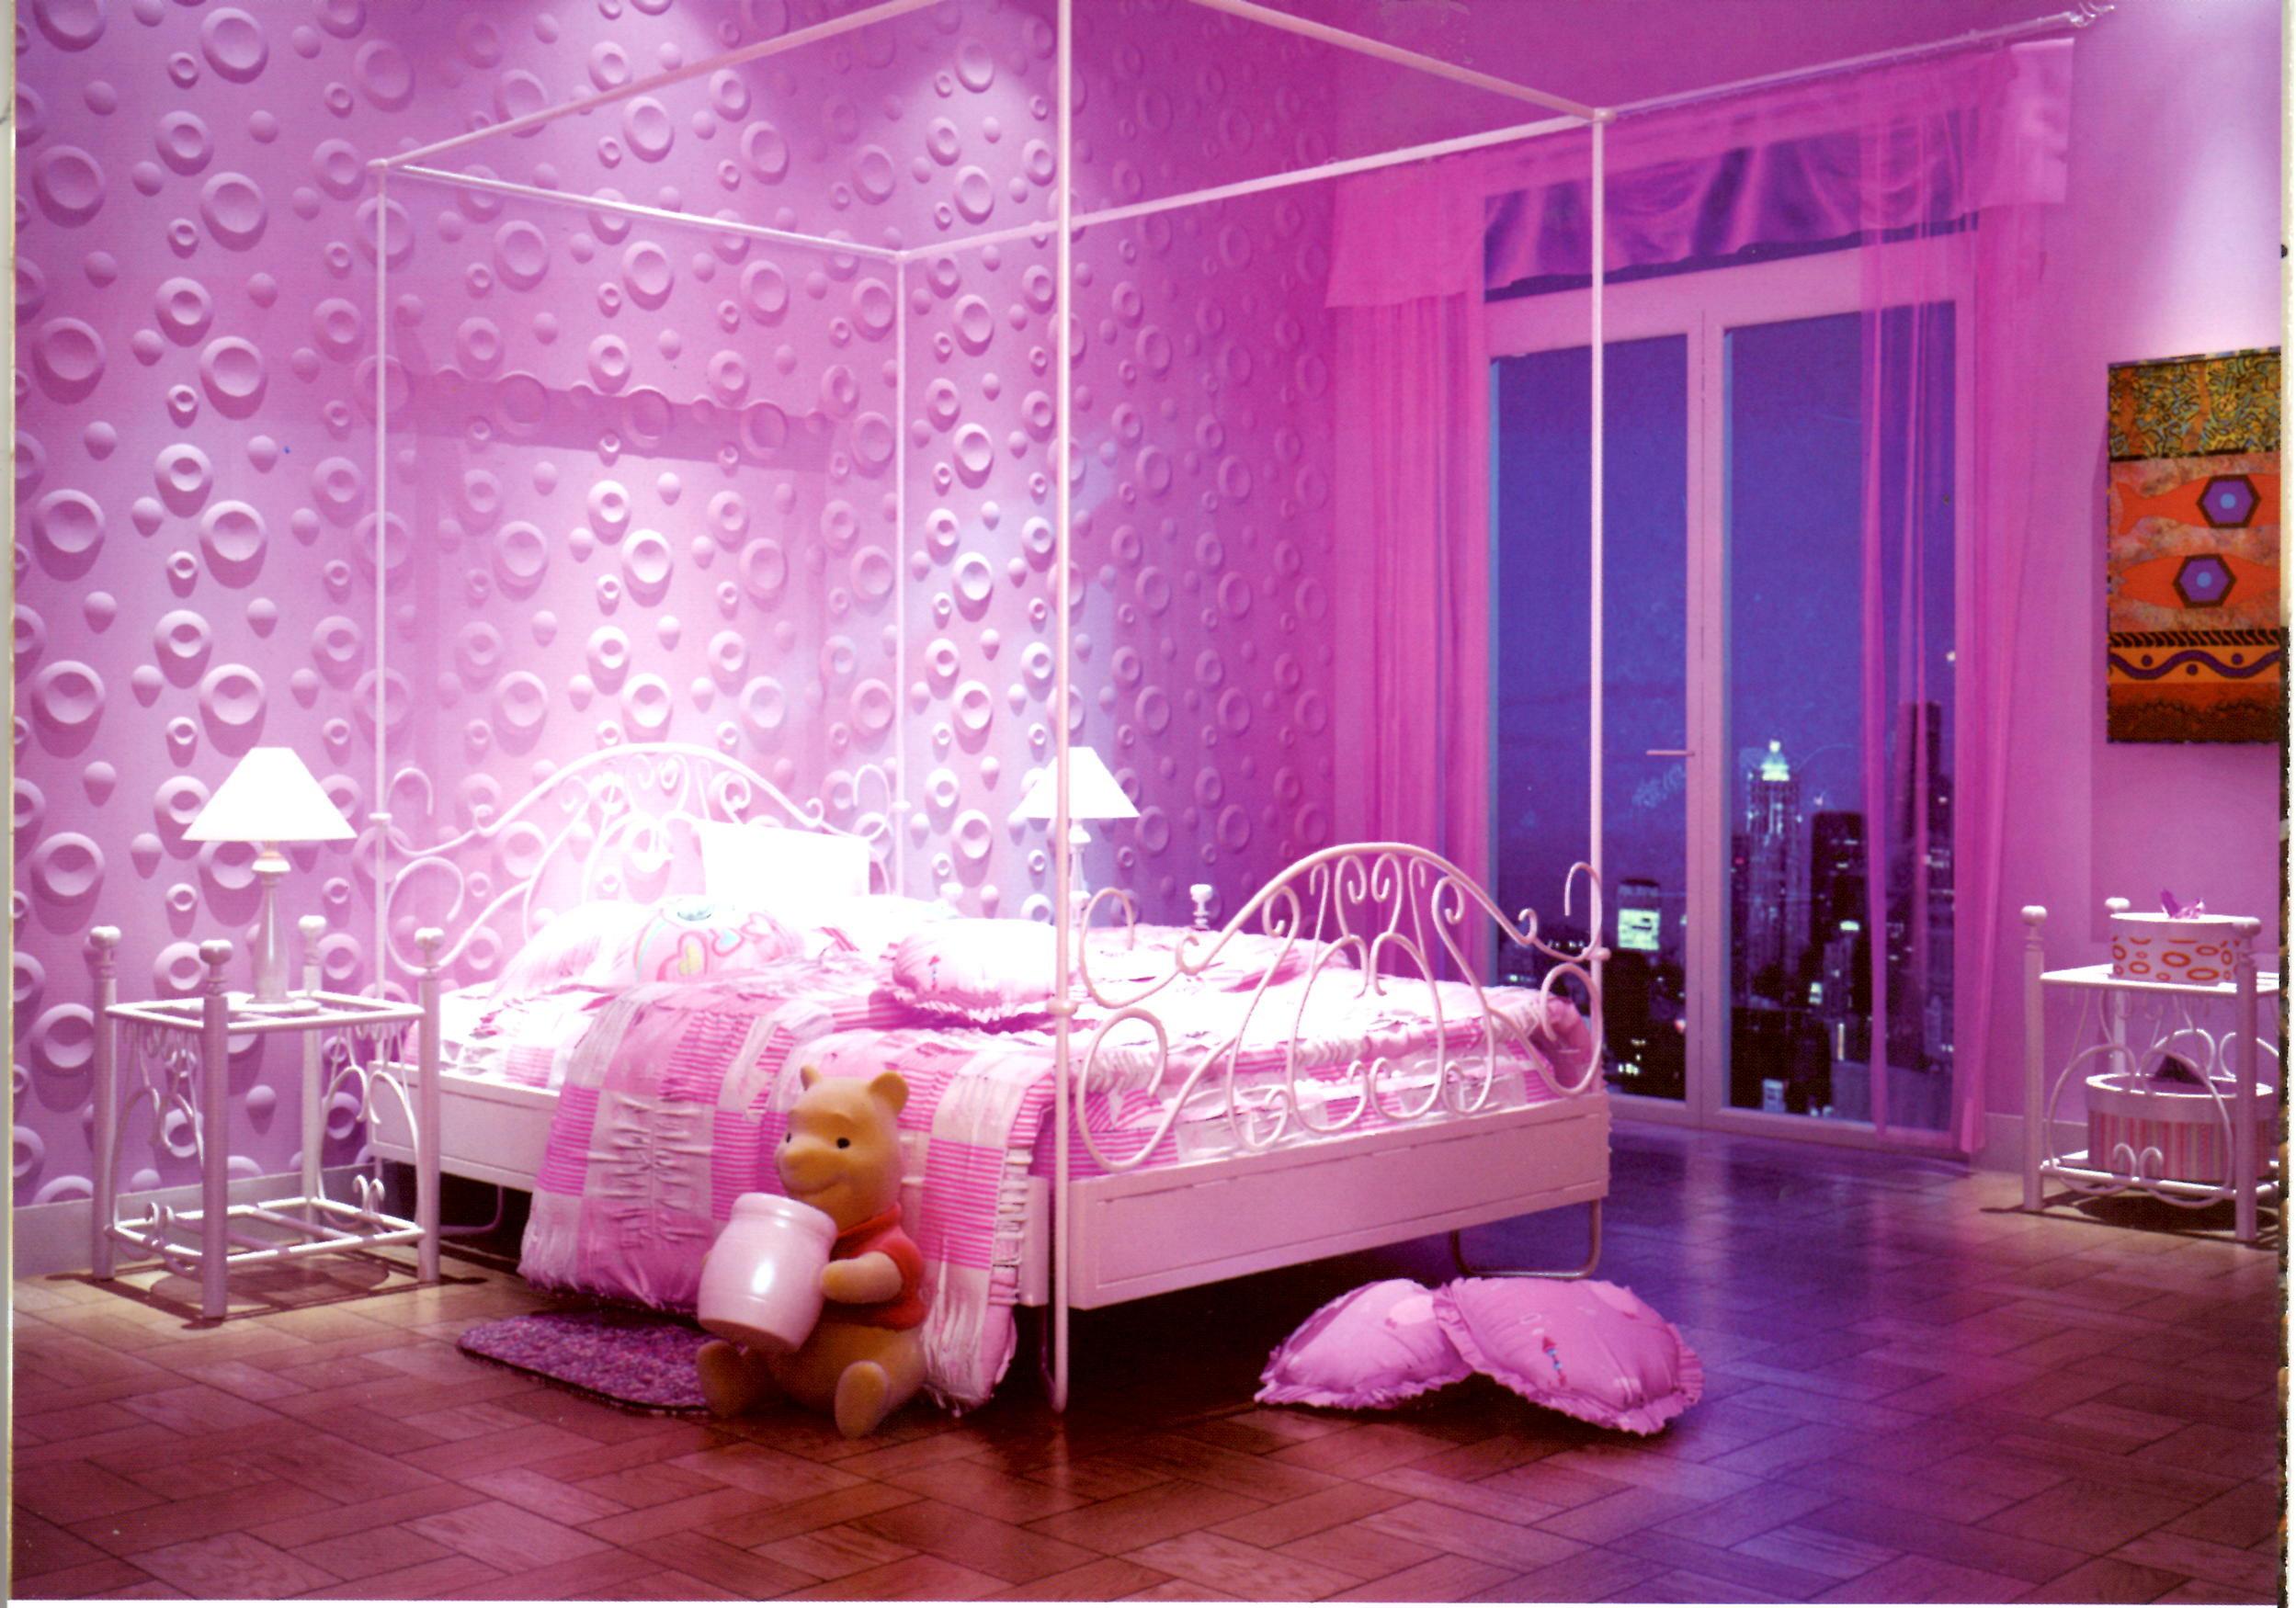 49+] Pink Wallpaper for Girls Room on WallpaperSafari